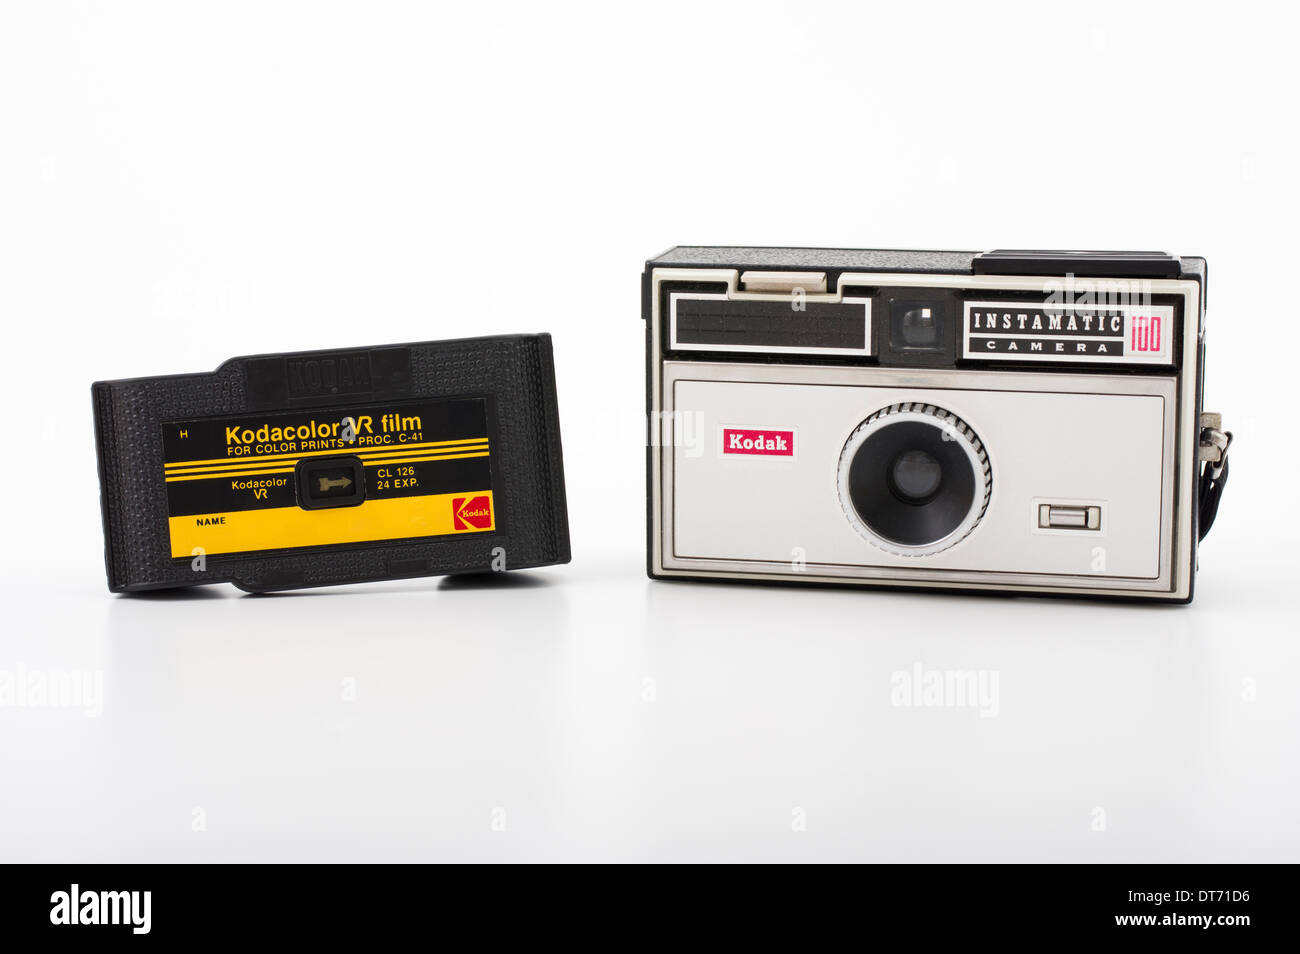 Kodak instamatic 100 film camera and Kodak 126 color print film - Stock Image